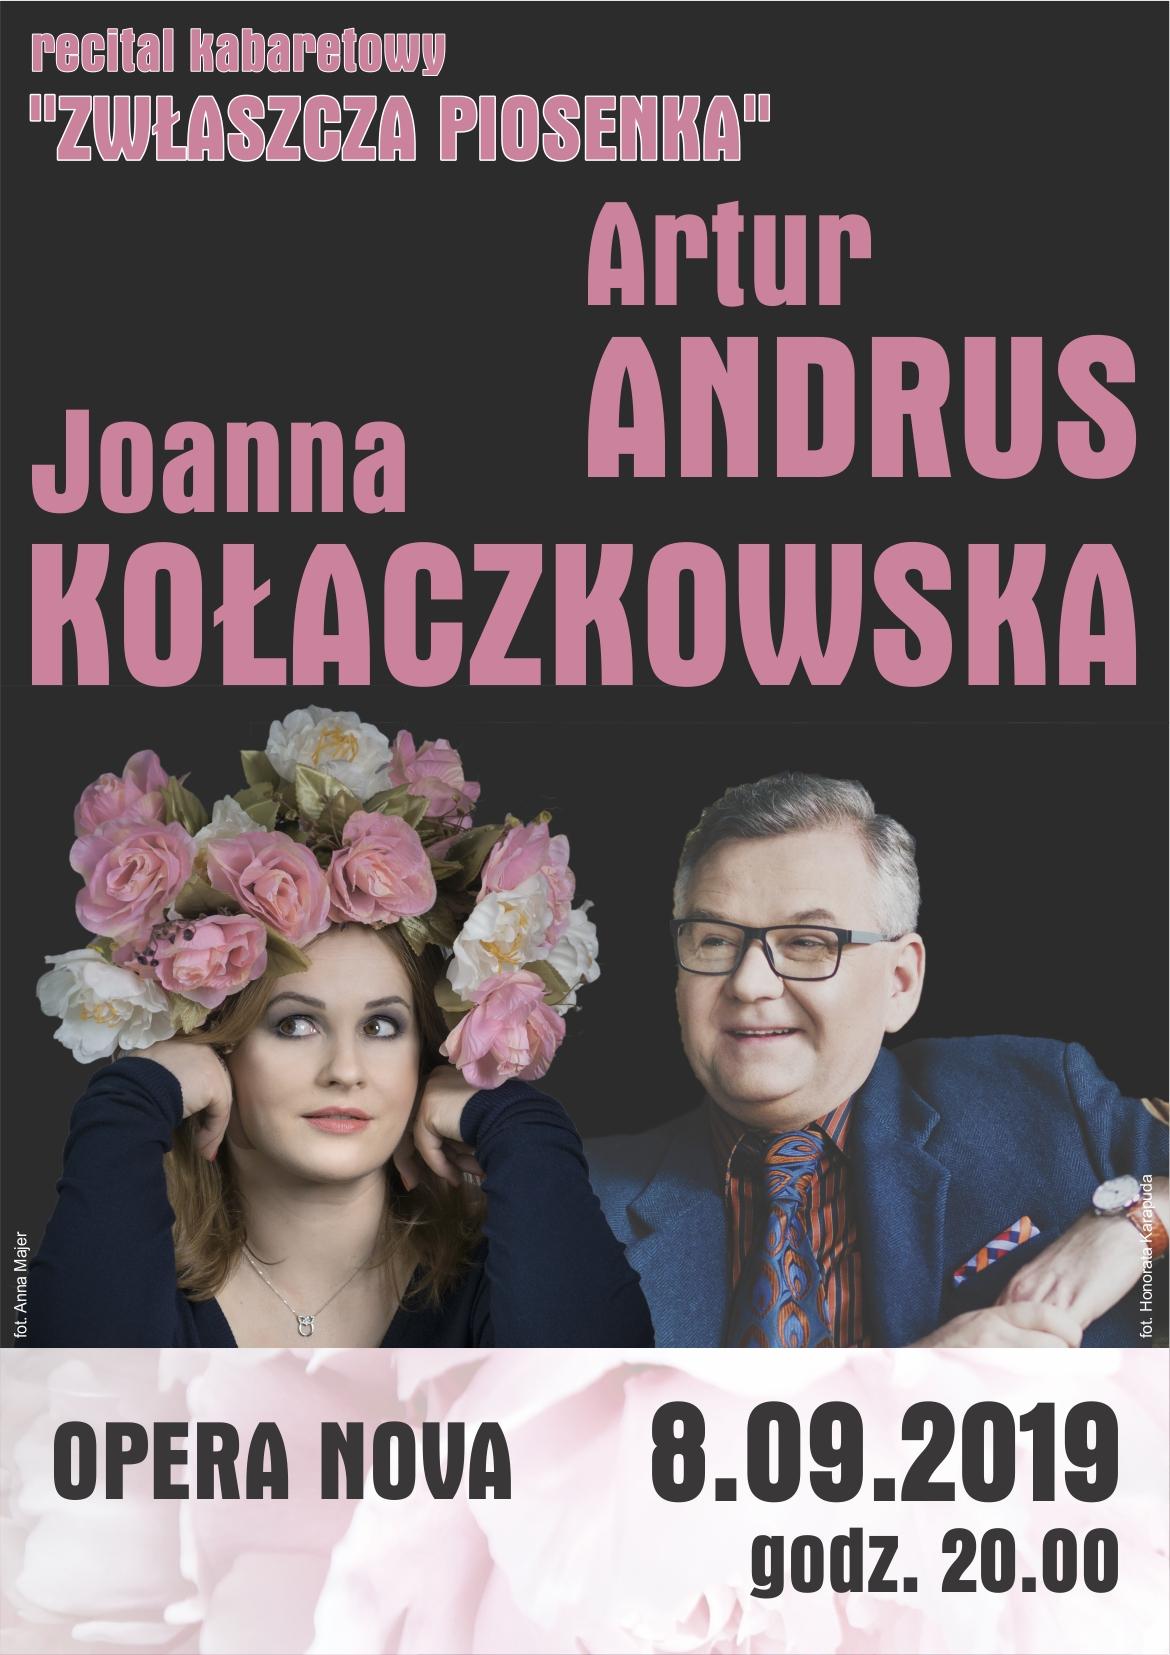 JOANNA KOŁACZKOWSKA ARTUR ANDRUS